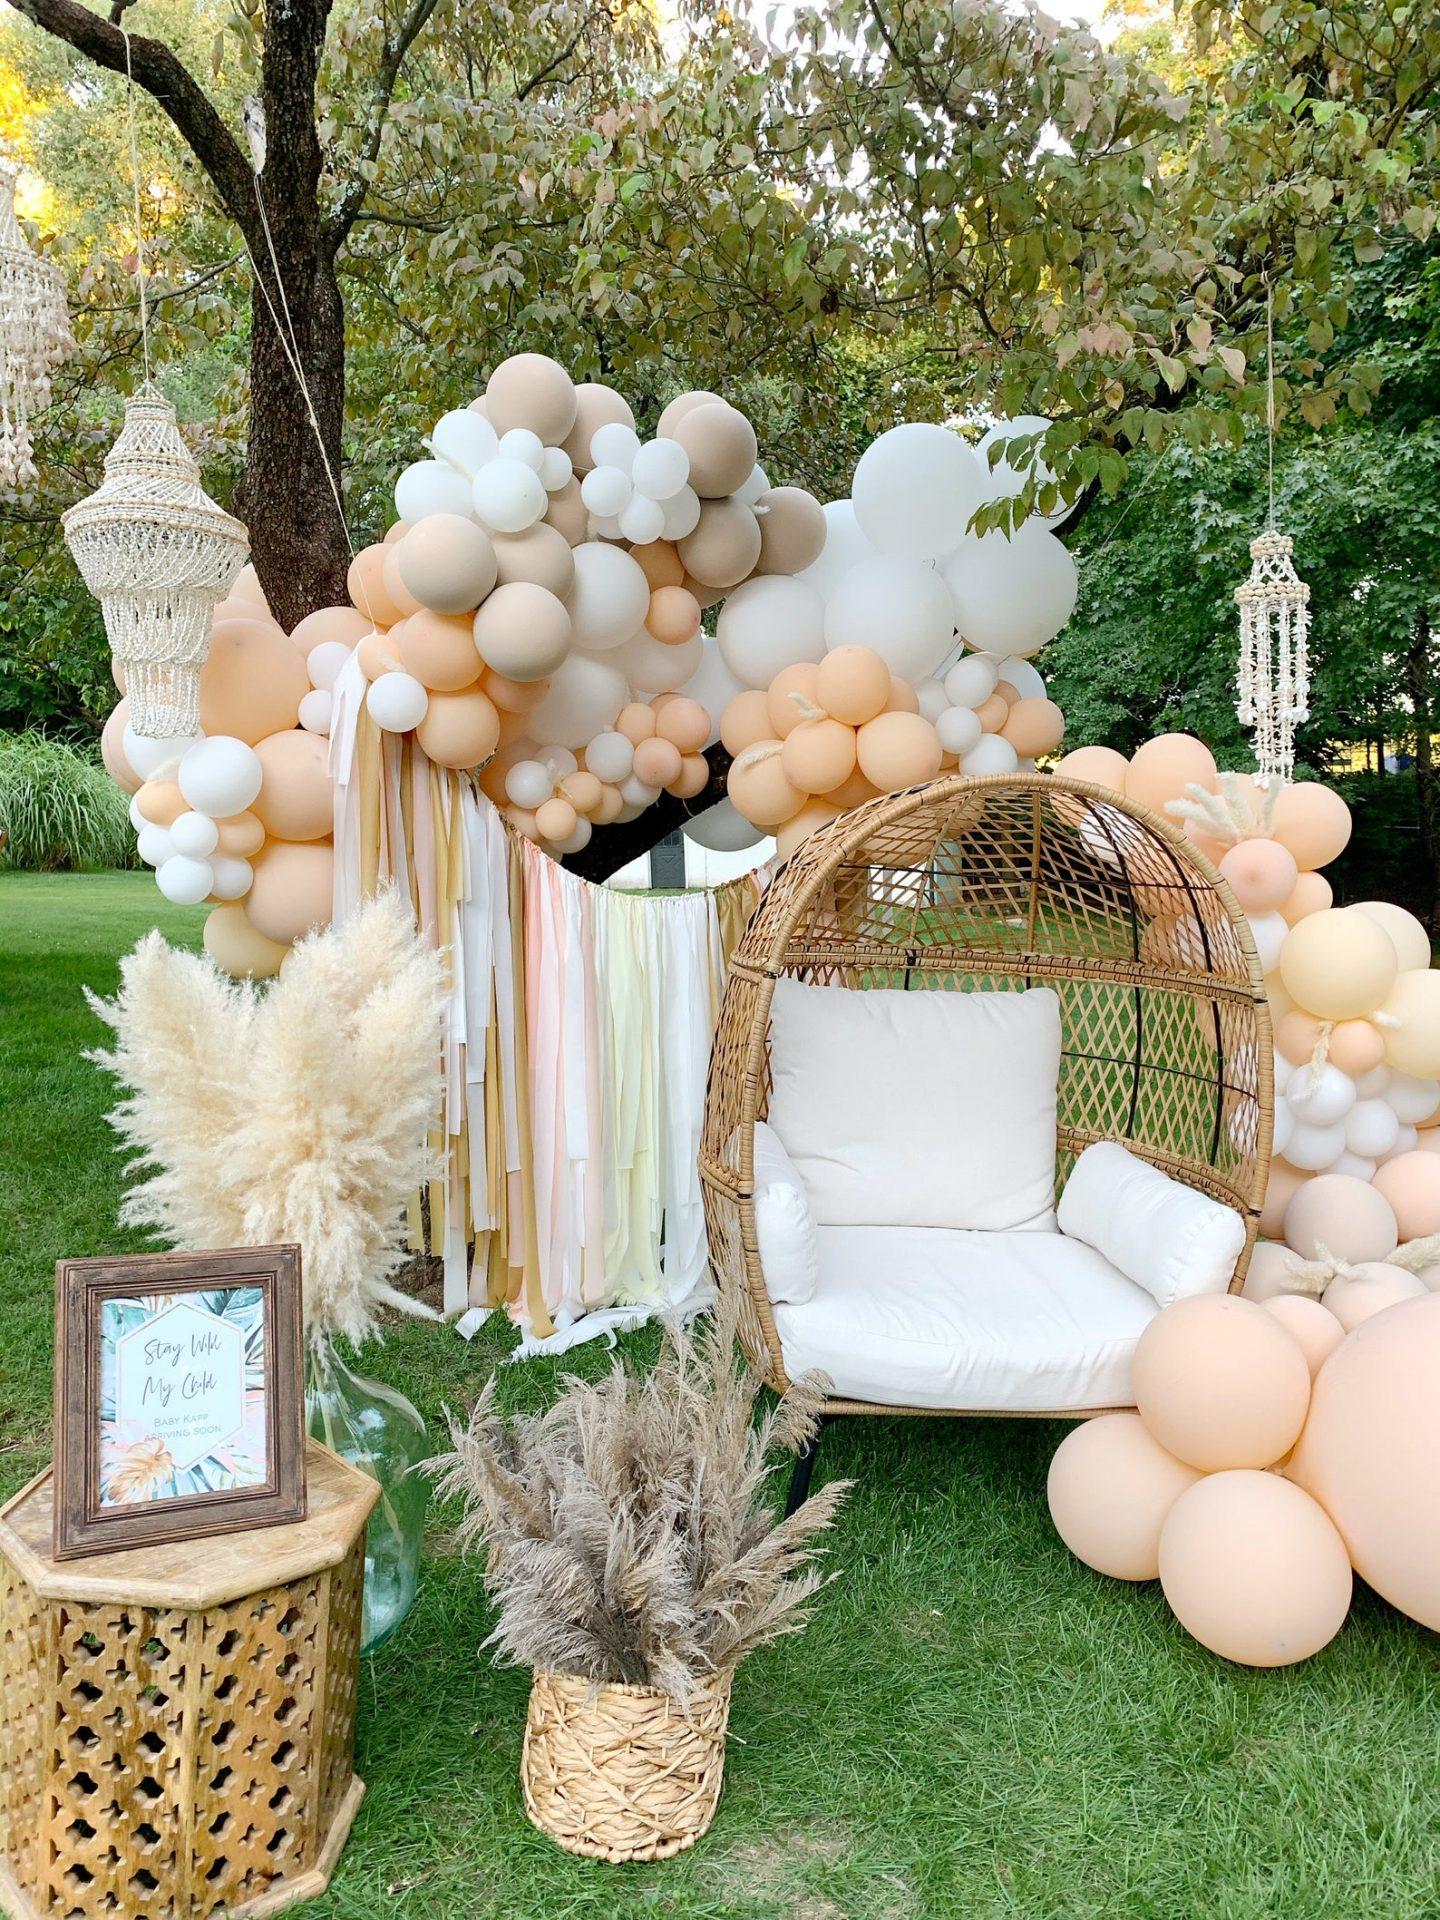 White, peach and cream birthday party balloons